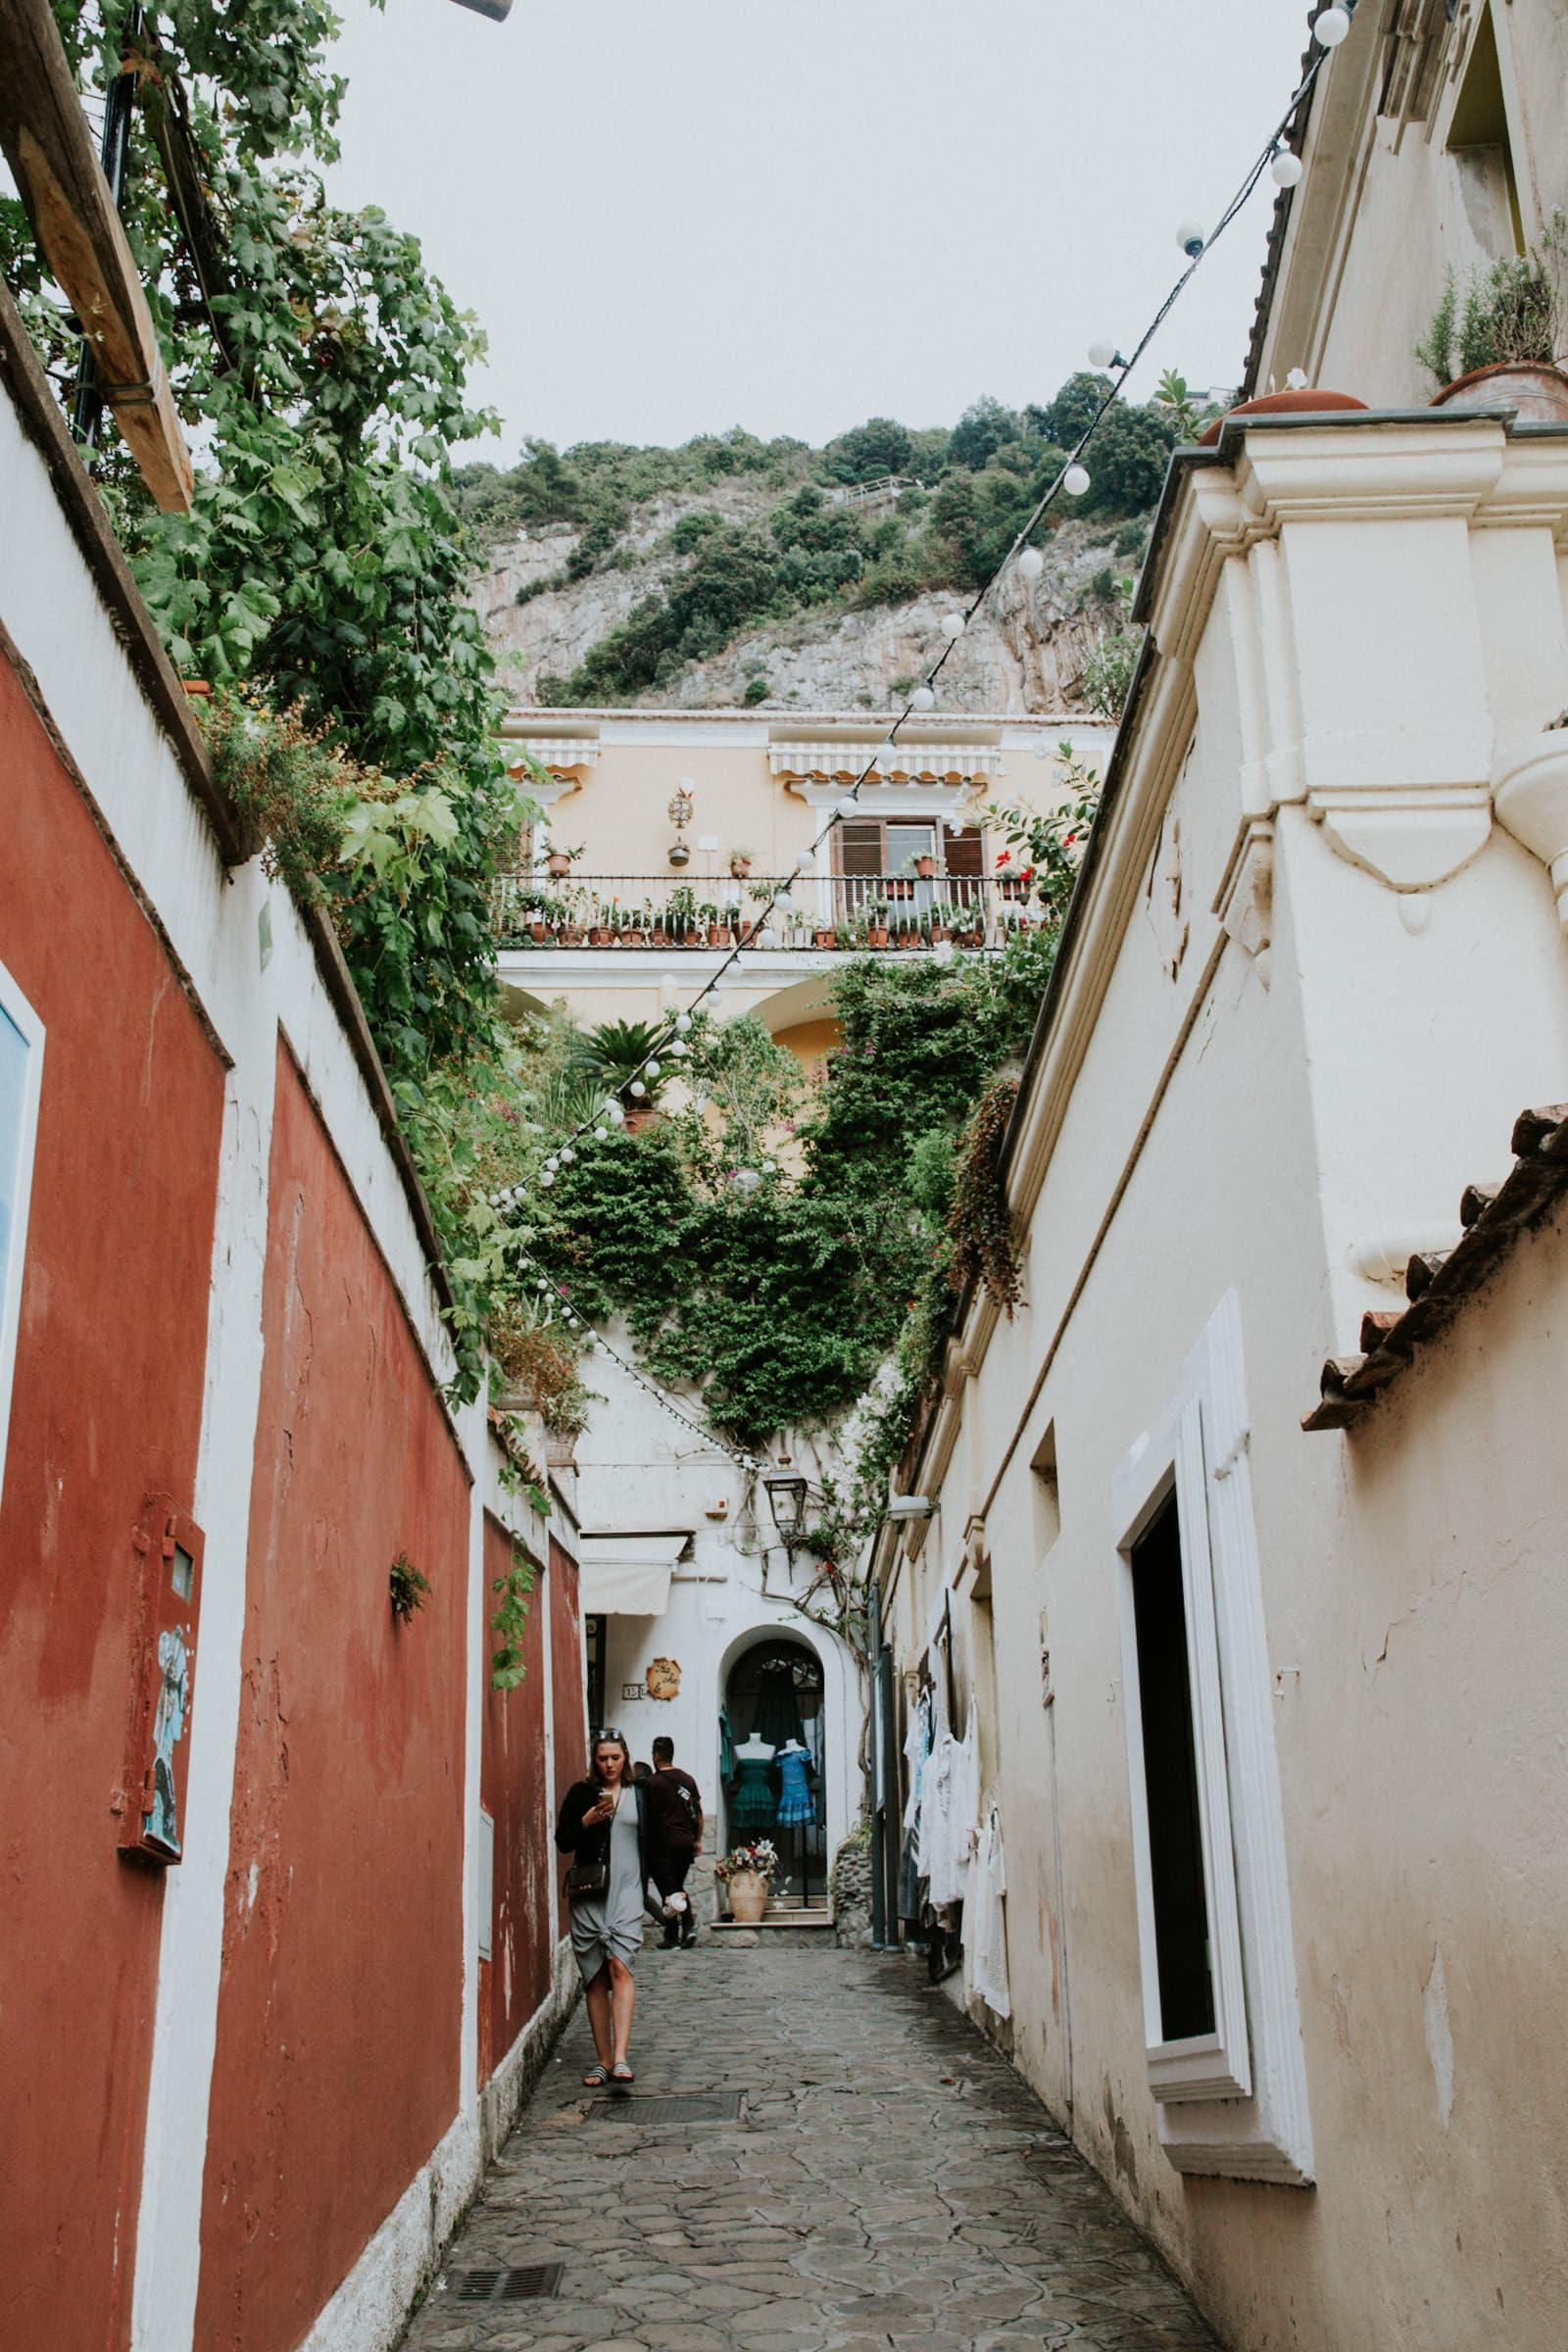 Street in Positano Italy Instagram Hotspot